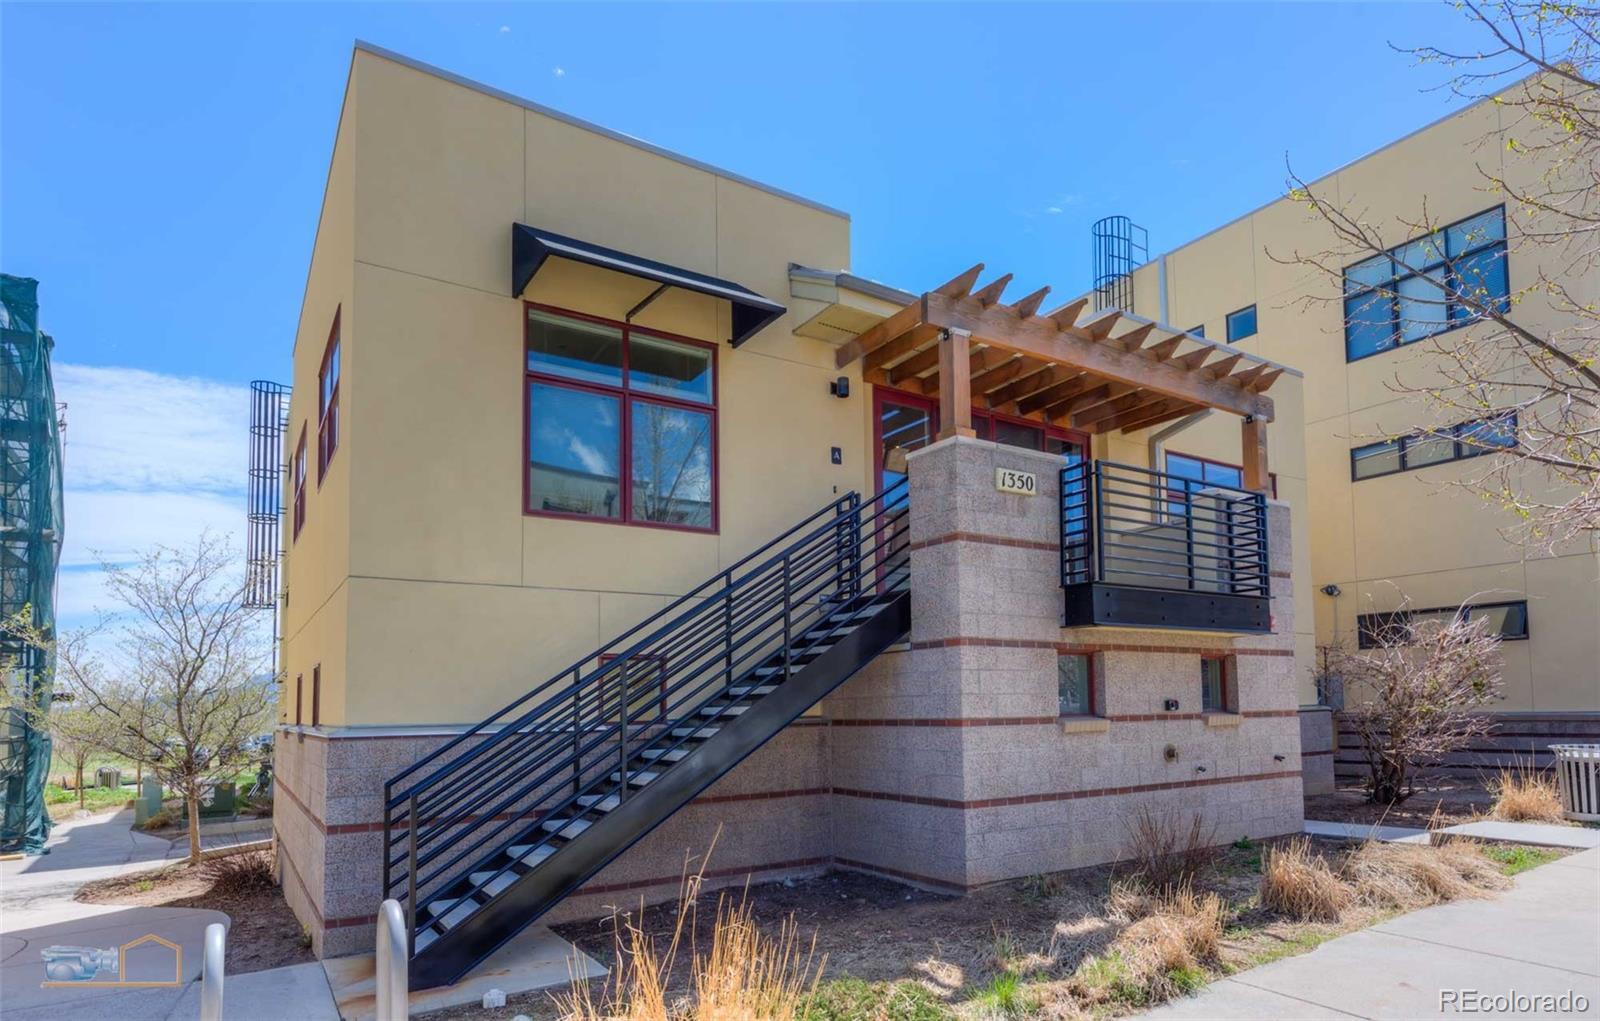 MLS# 8253378 - 1 - 1350 Rosewood Avenue, Boulder, CO 80304